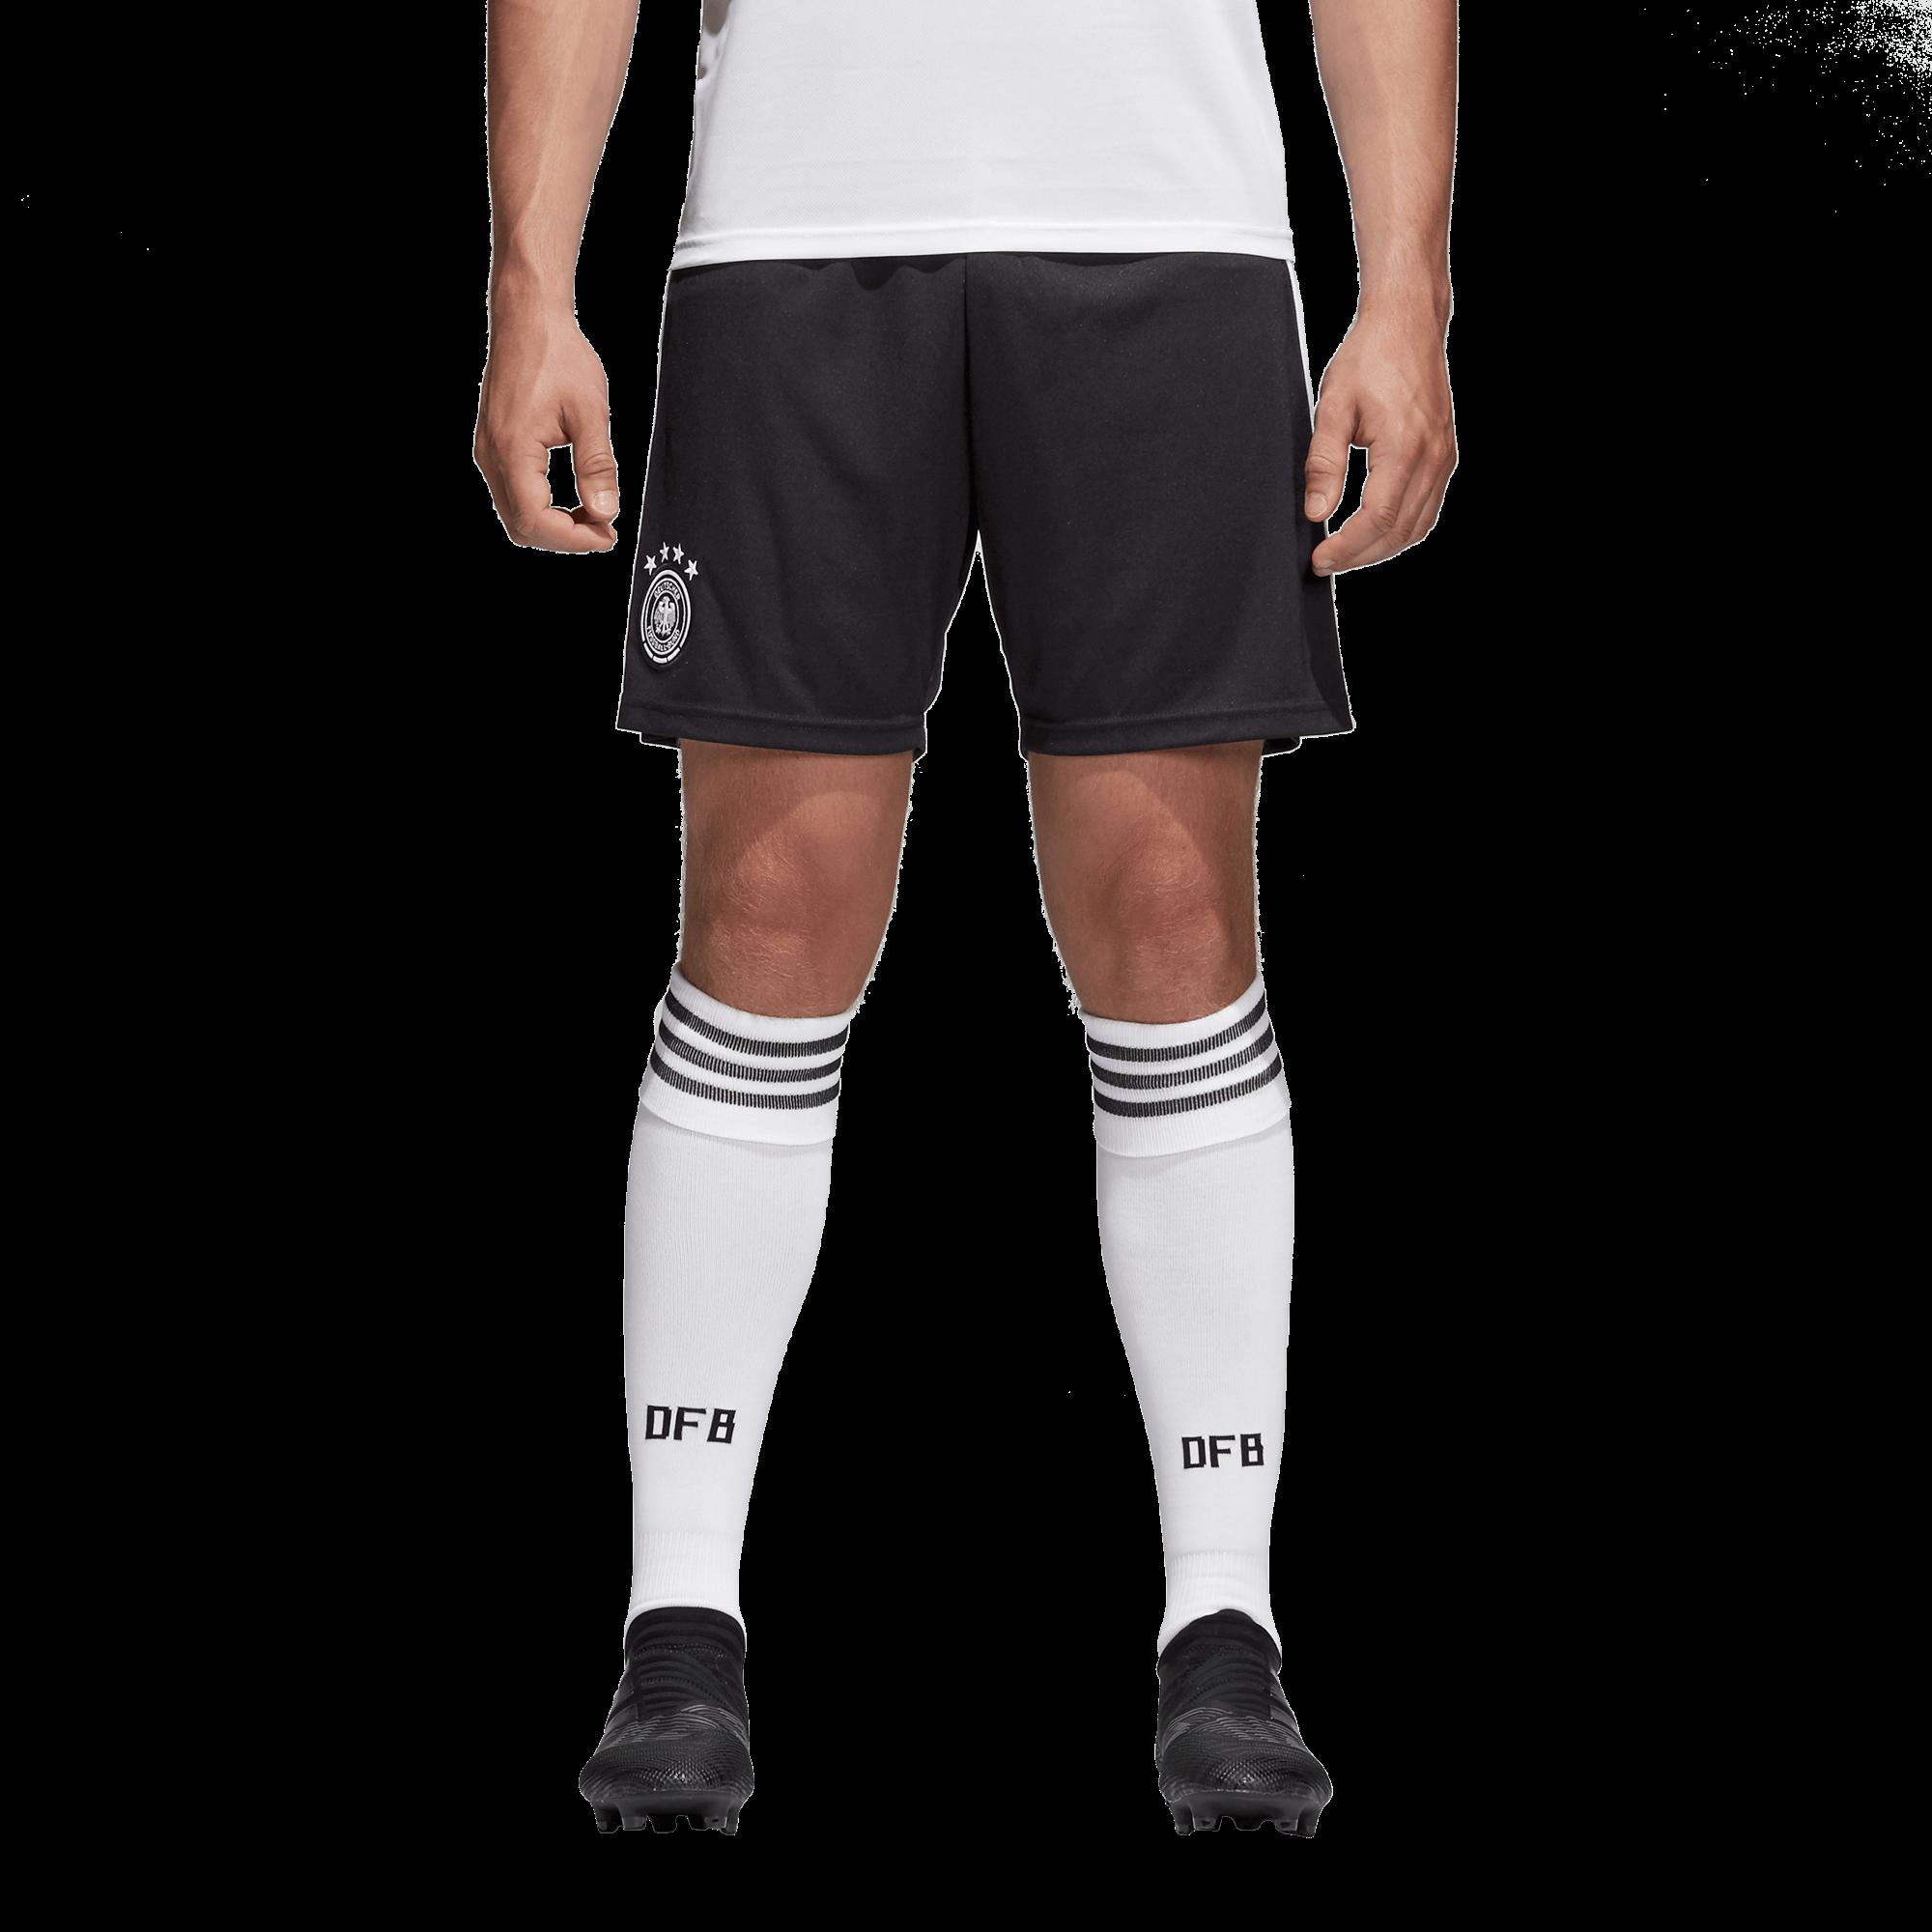 adidas Duitsland Thuisbroekje WK2018 Voorkant